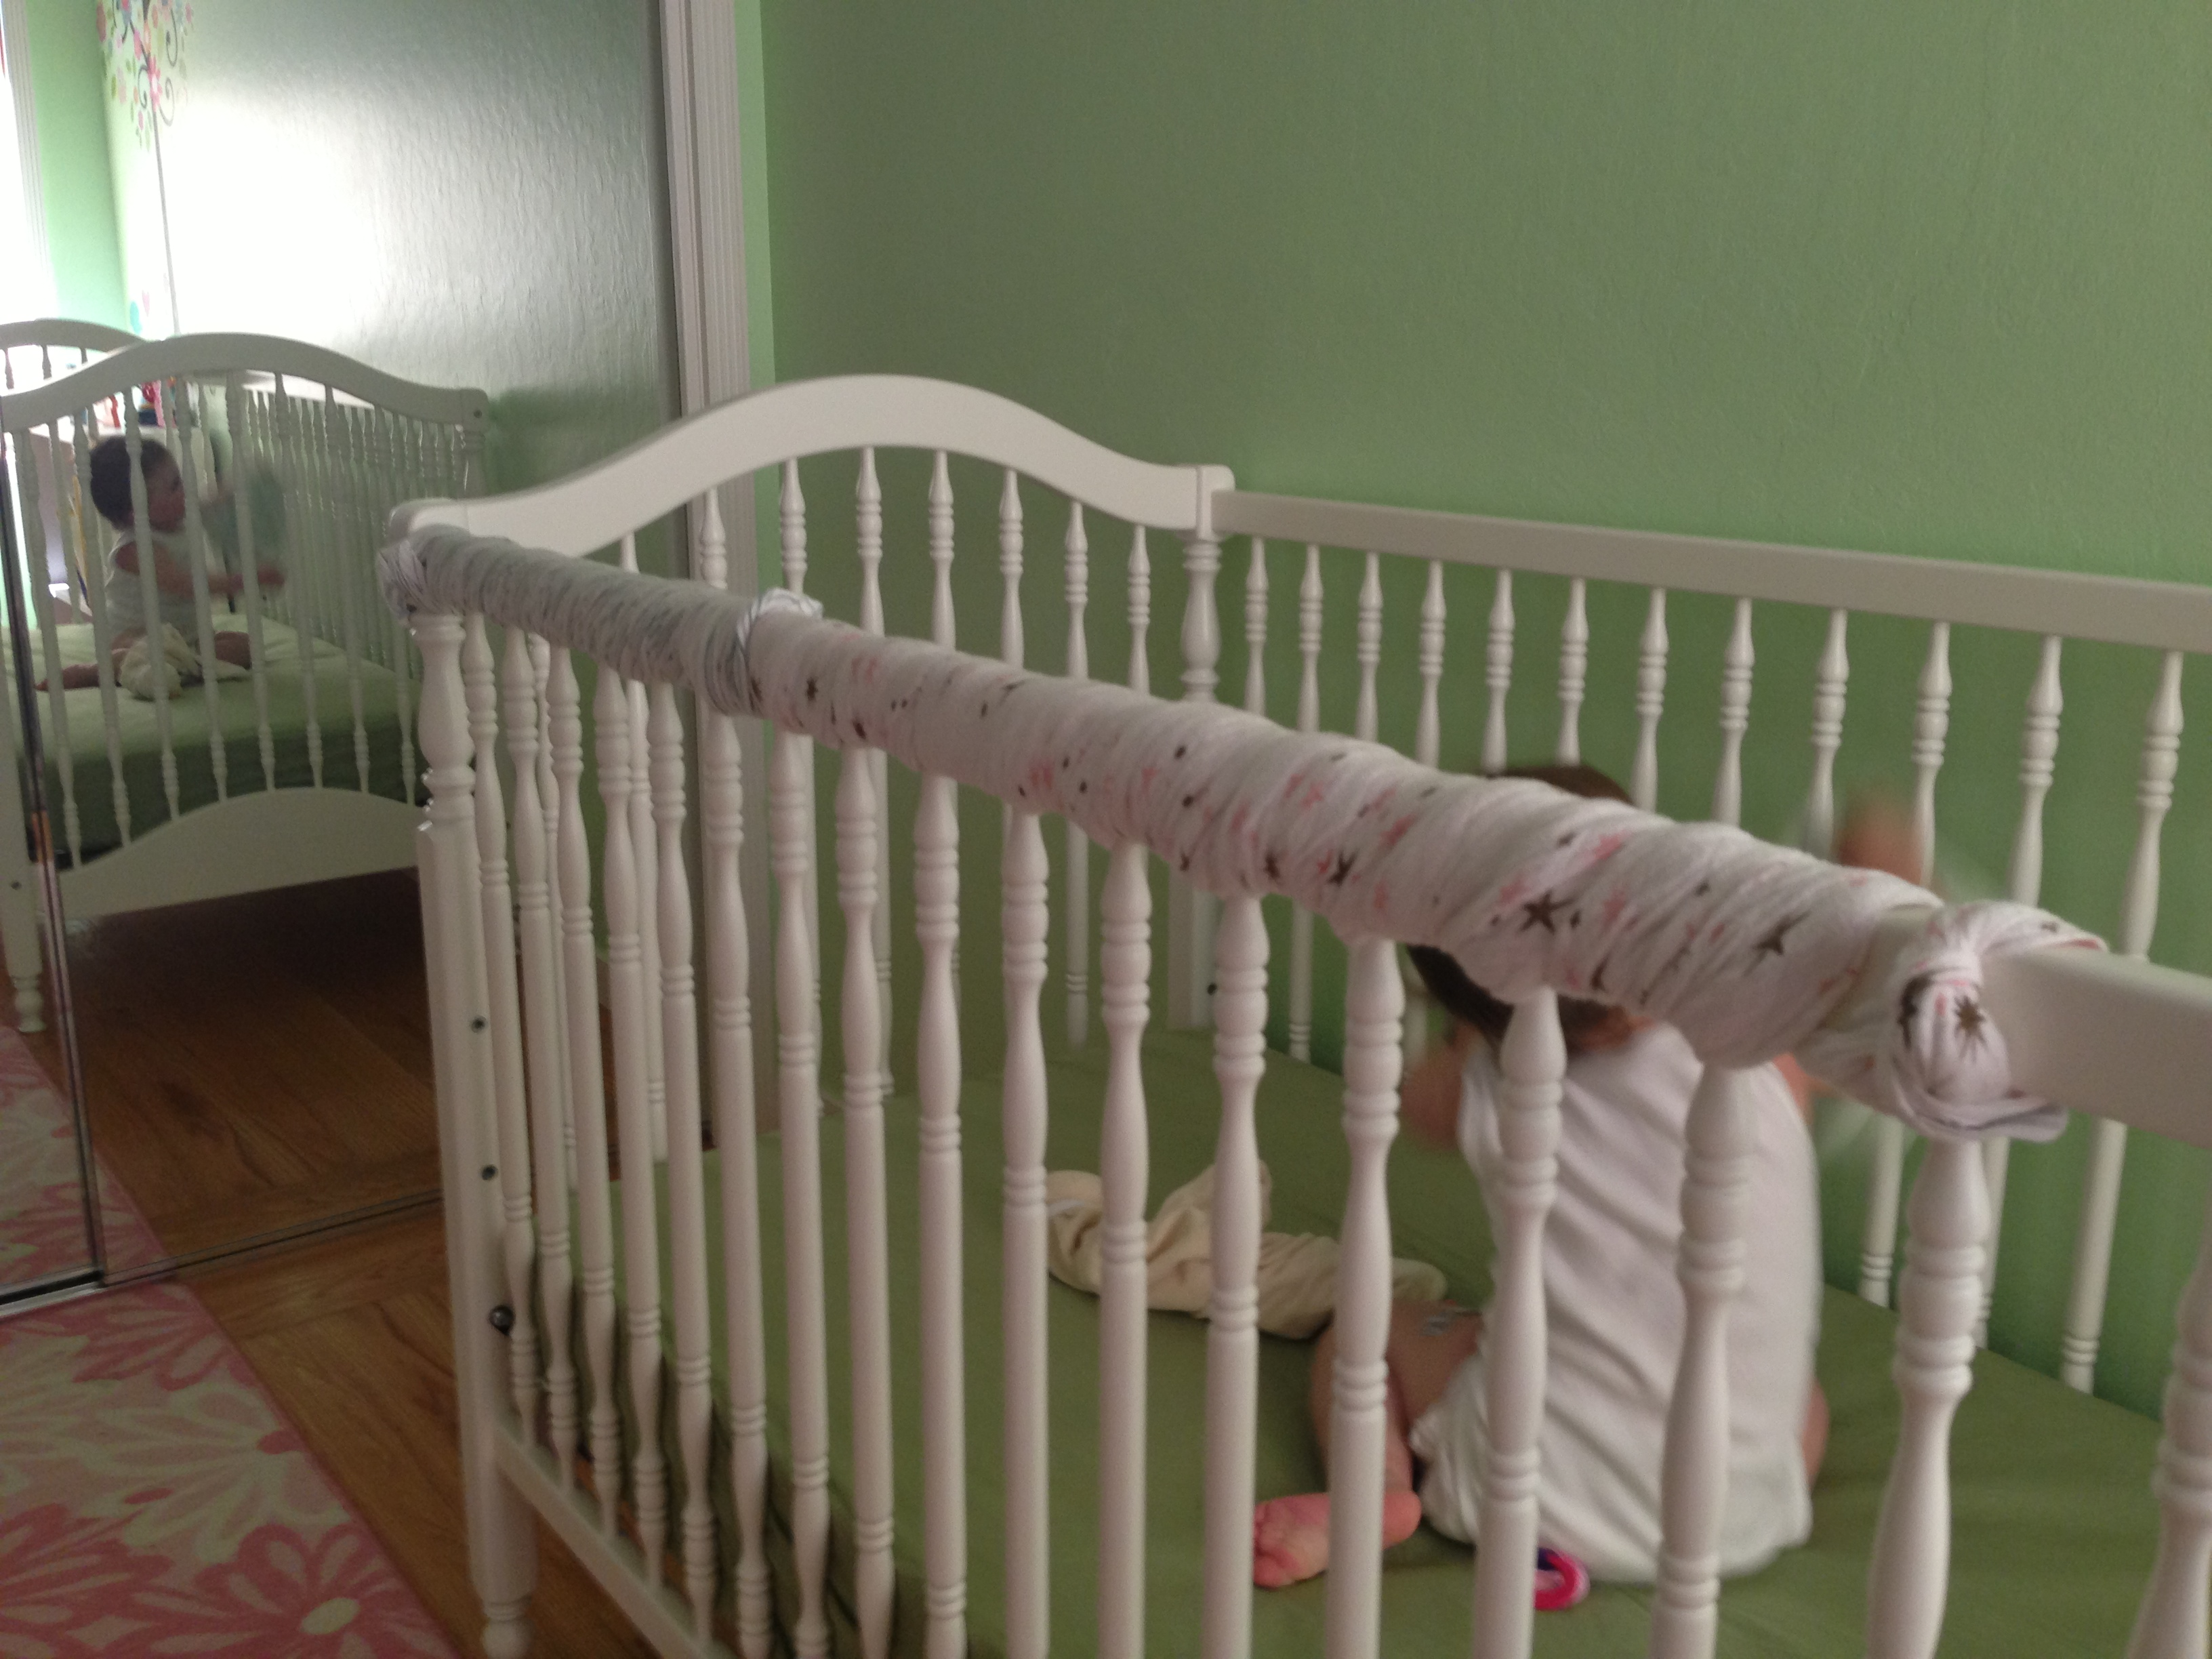 Crib protector for babies - Crib Protector For Babies 31